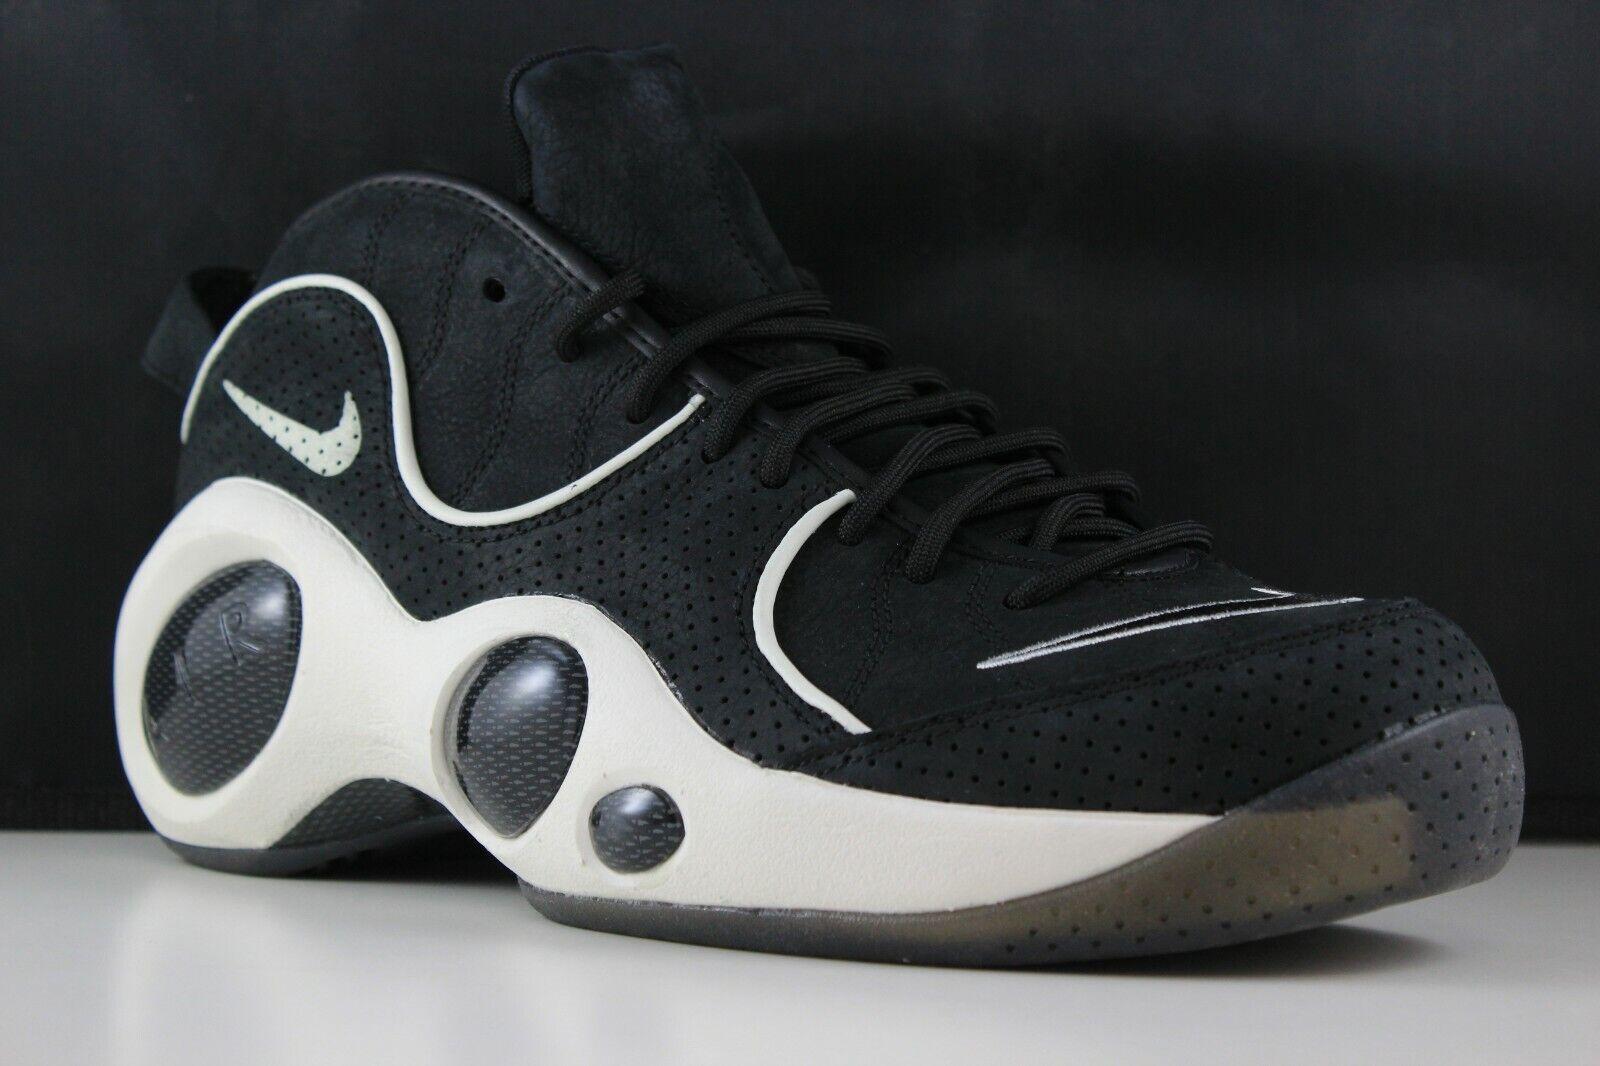 NikeLab Zoom Flight 95 Taille 10 Homme noir Voile 941943-002